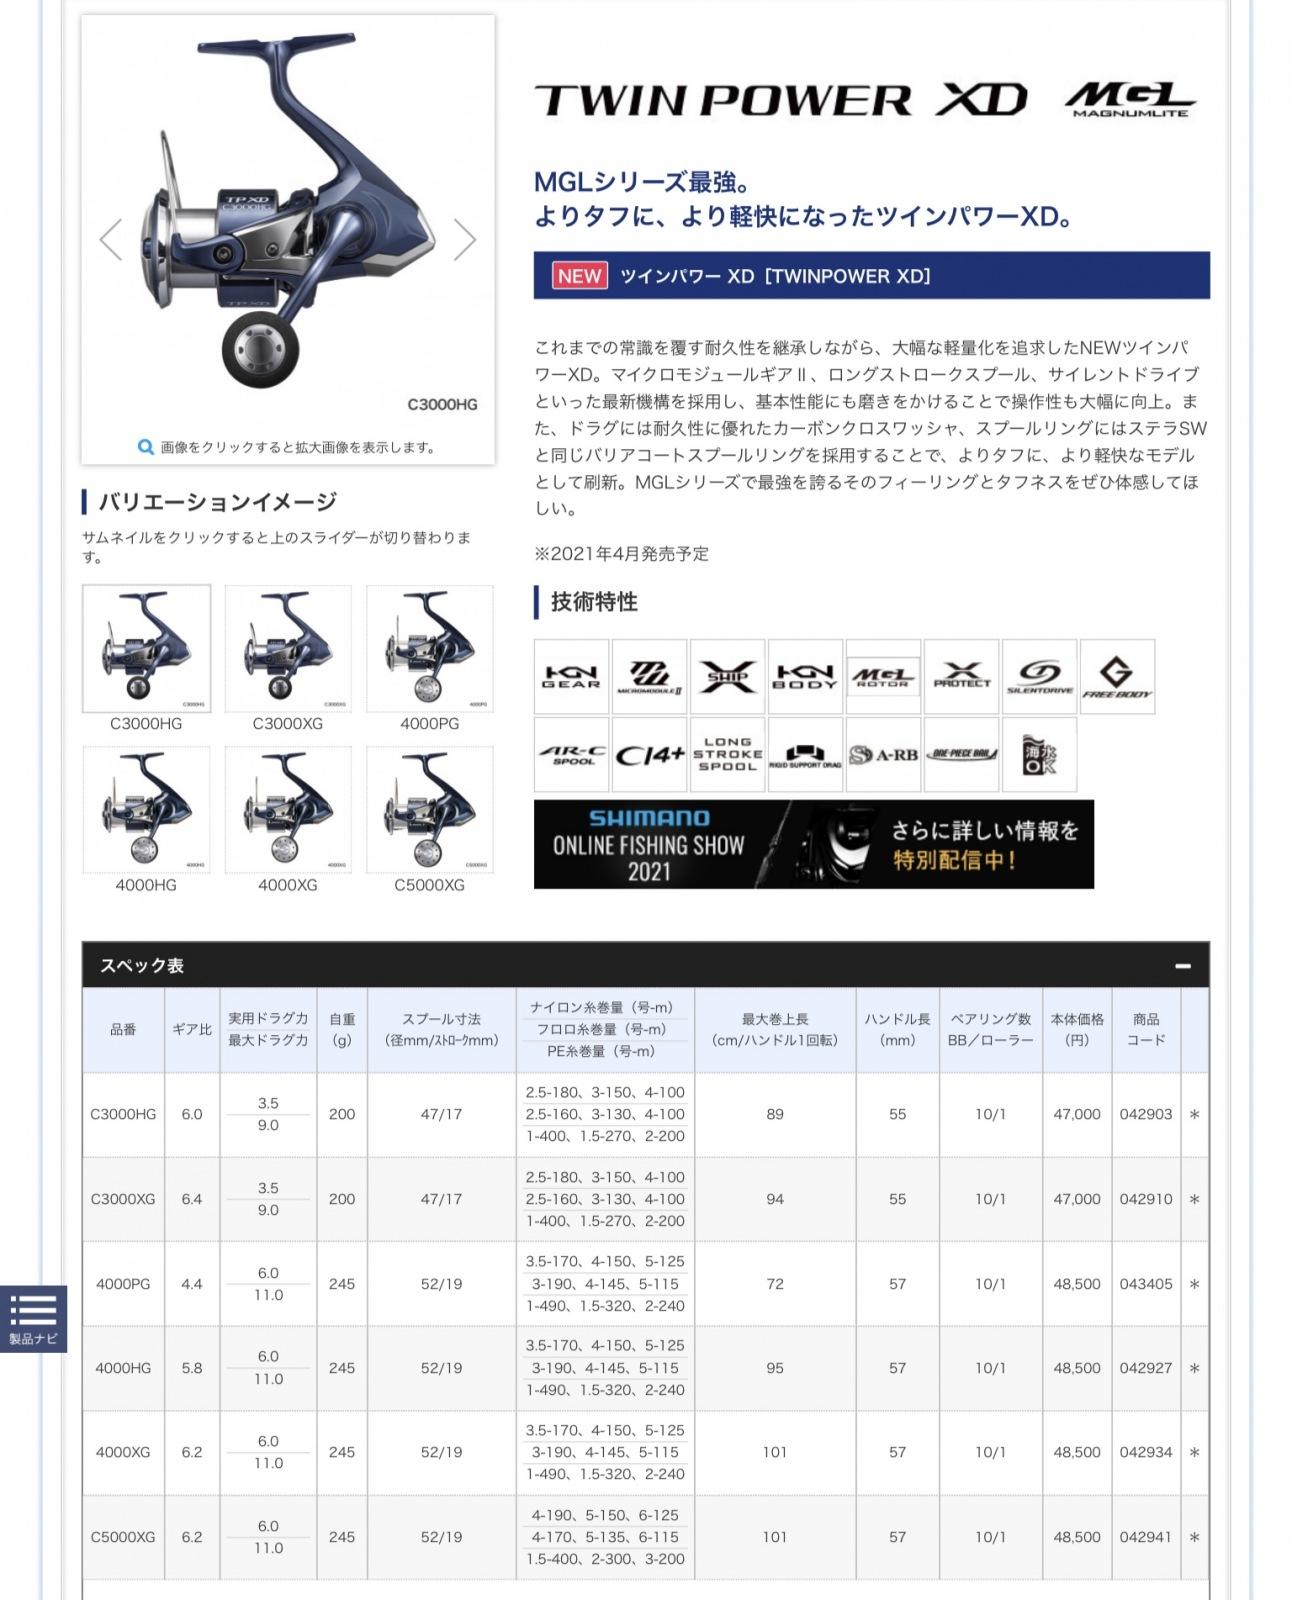 3500AD3A-5447-438C-8A5E-2091915D374D.jpeg.c21c174d89dc090f3535d06b66cc6c3d.jpeg